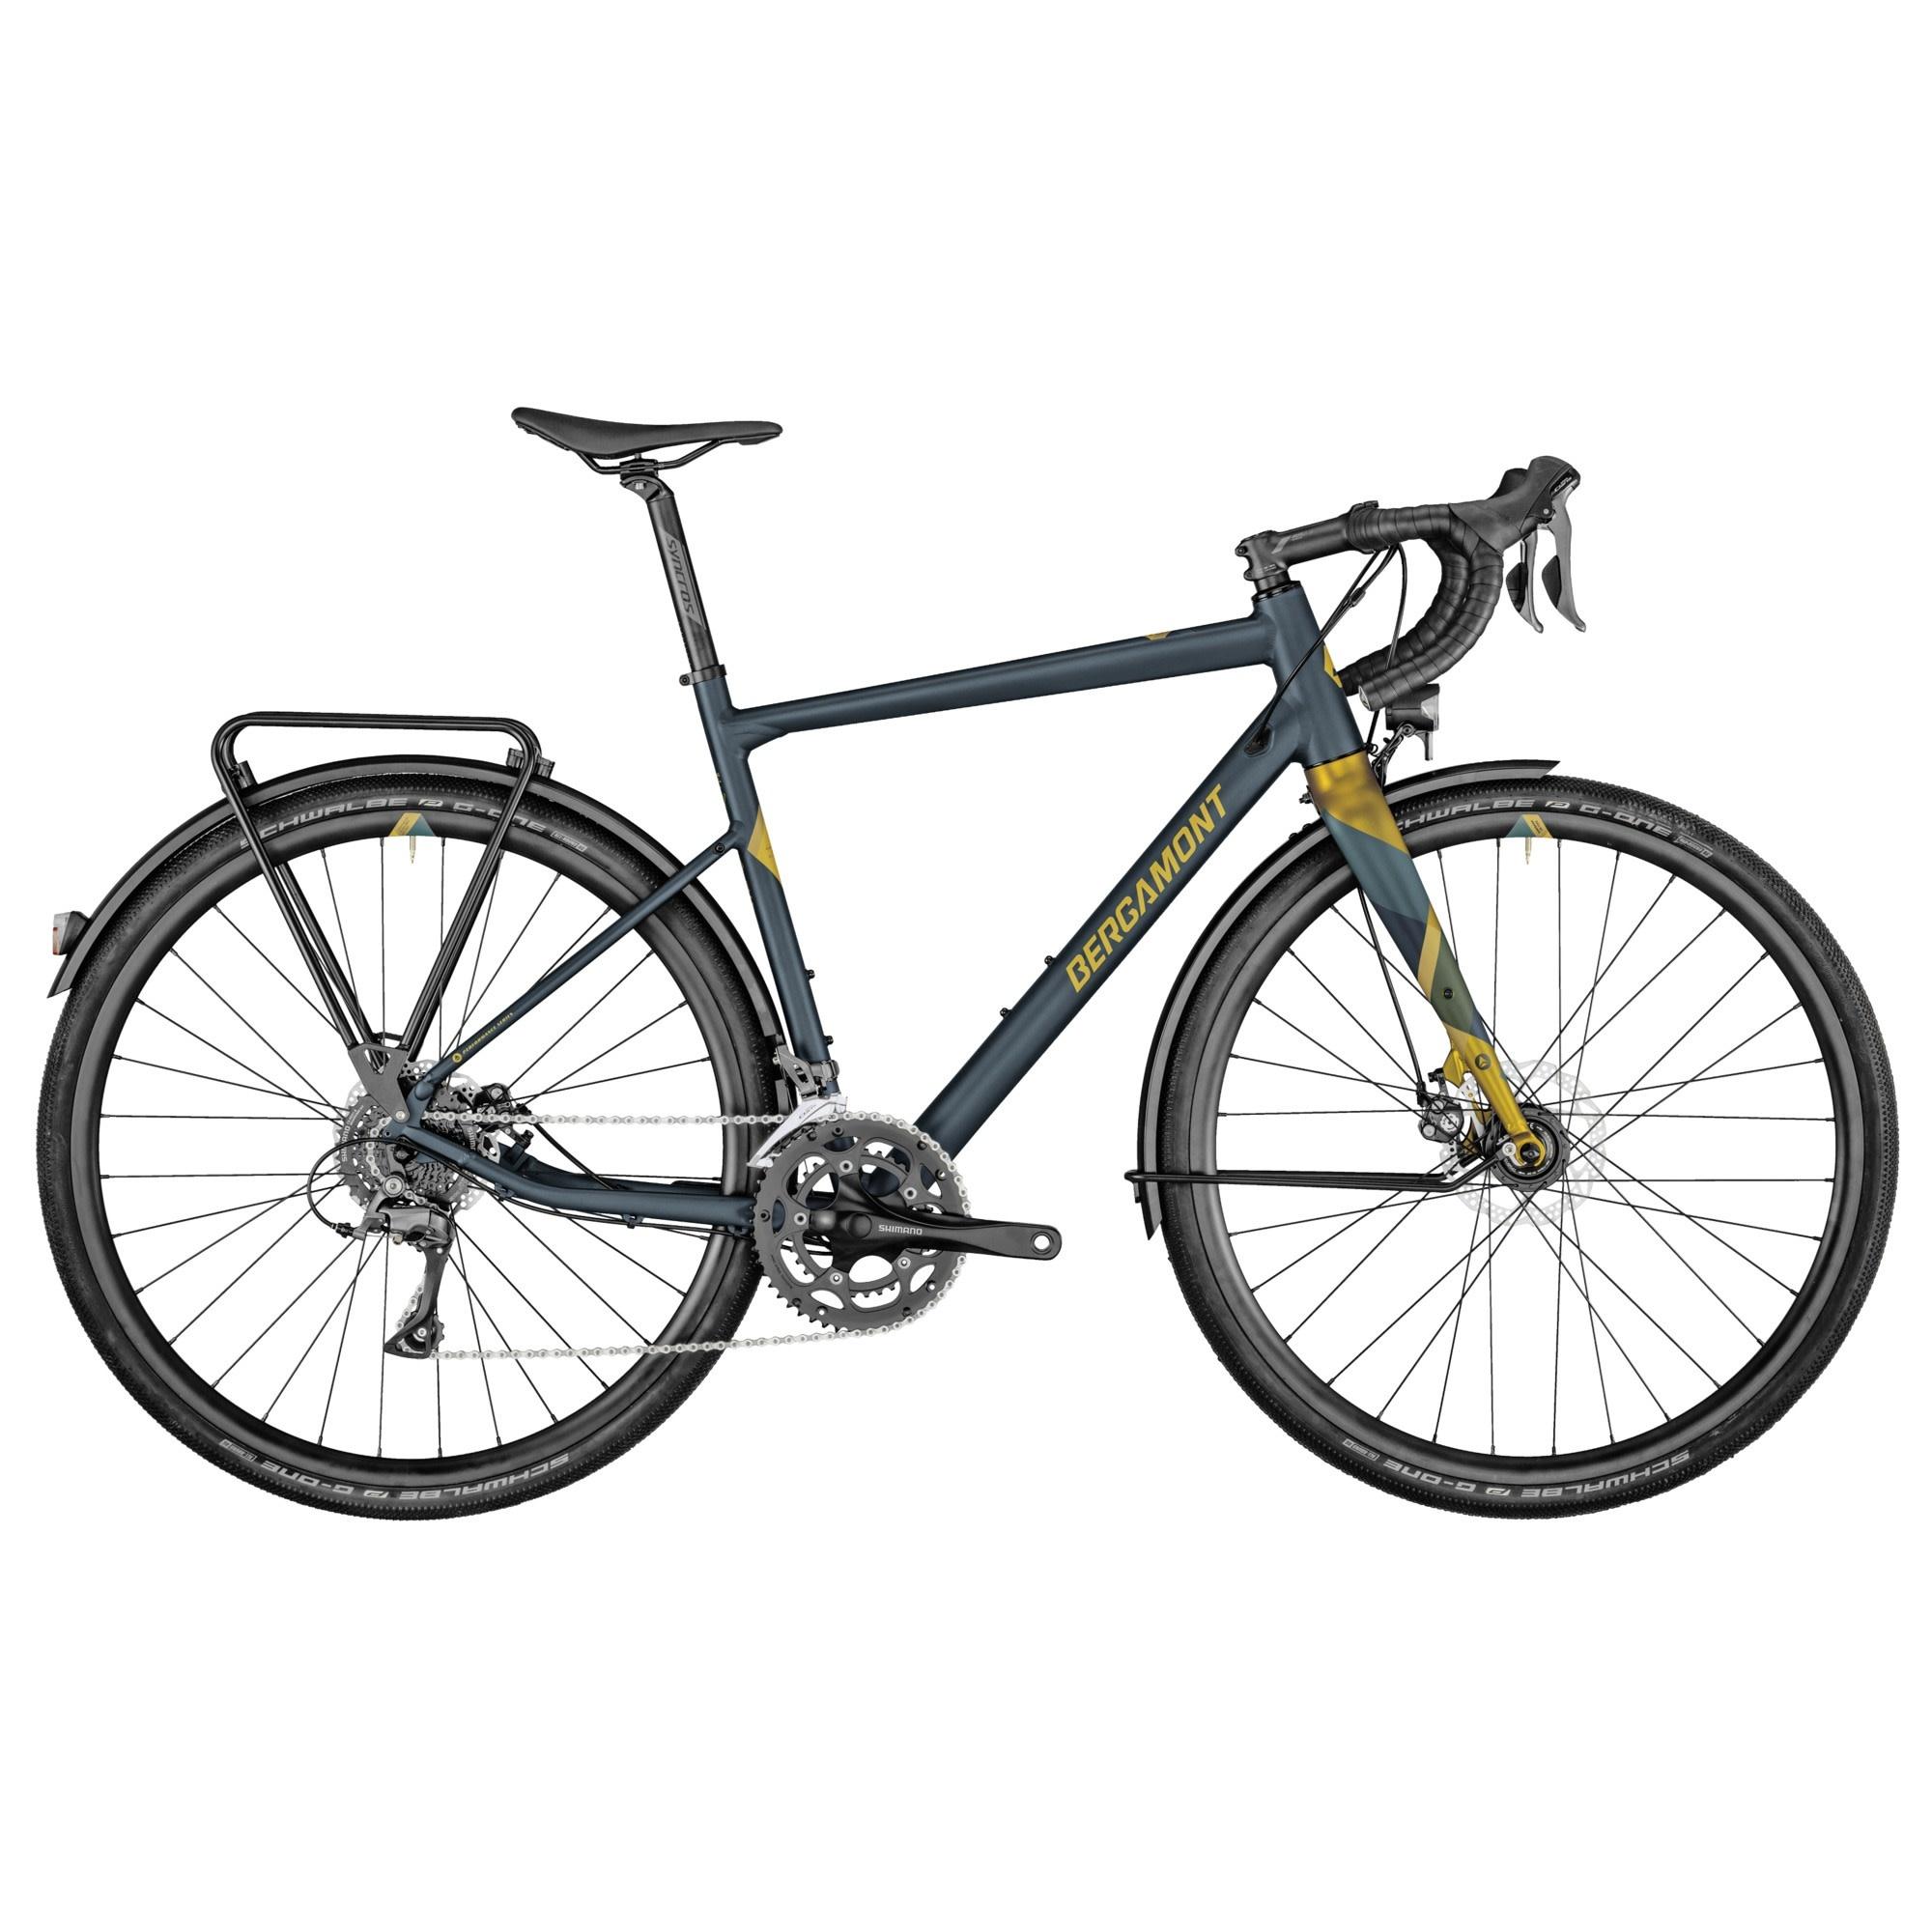 Bergamont Bergamont Bike Grandurance RD 3 - Petrol (53)